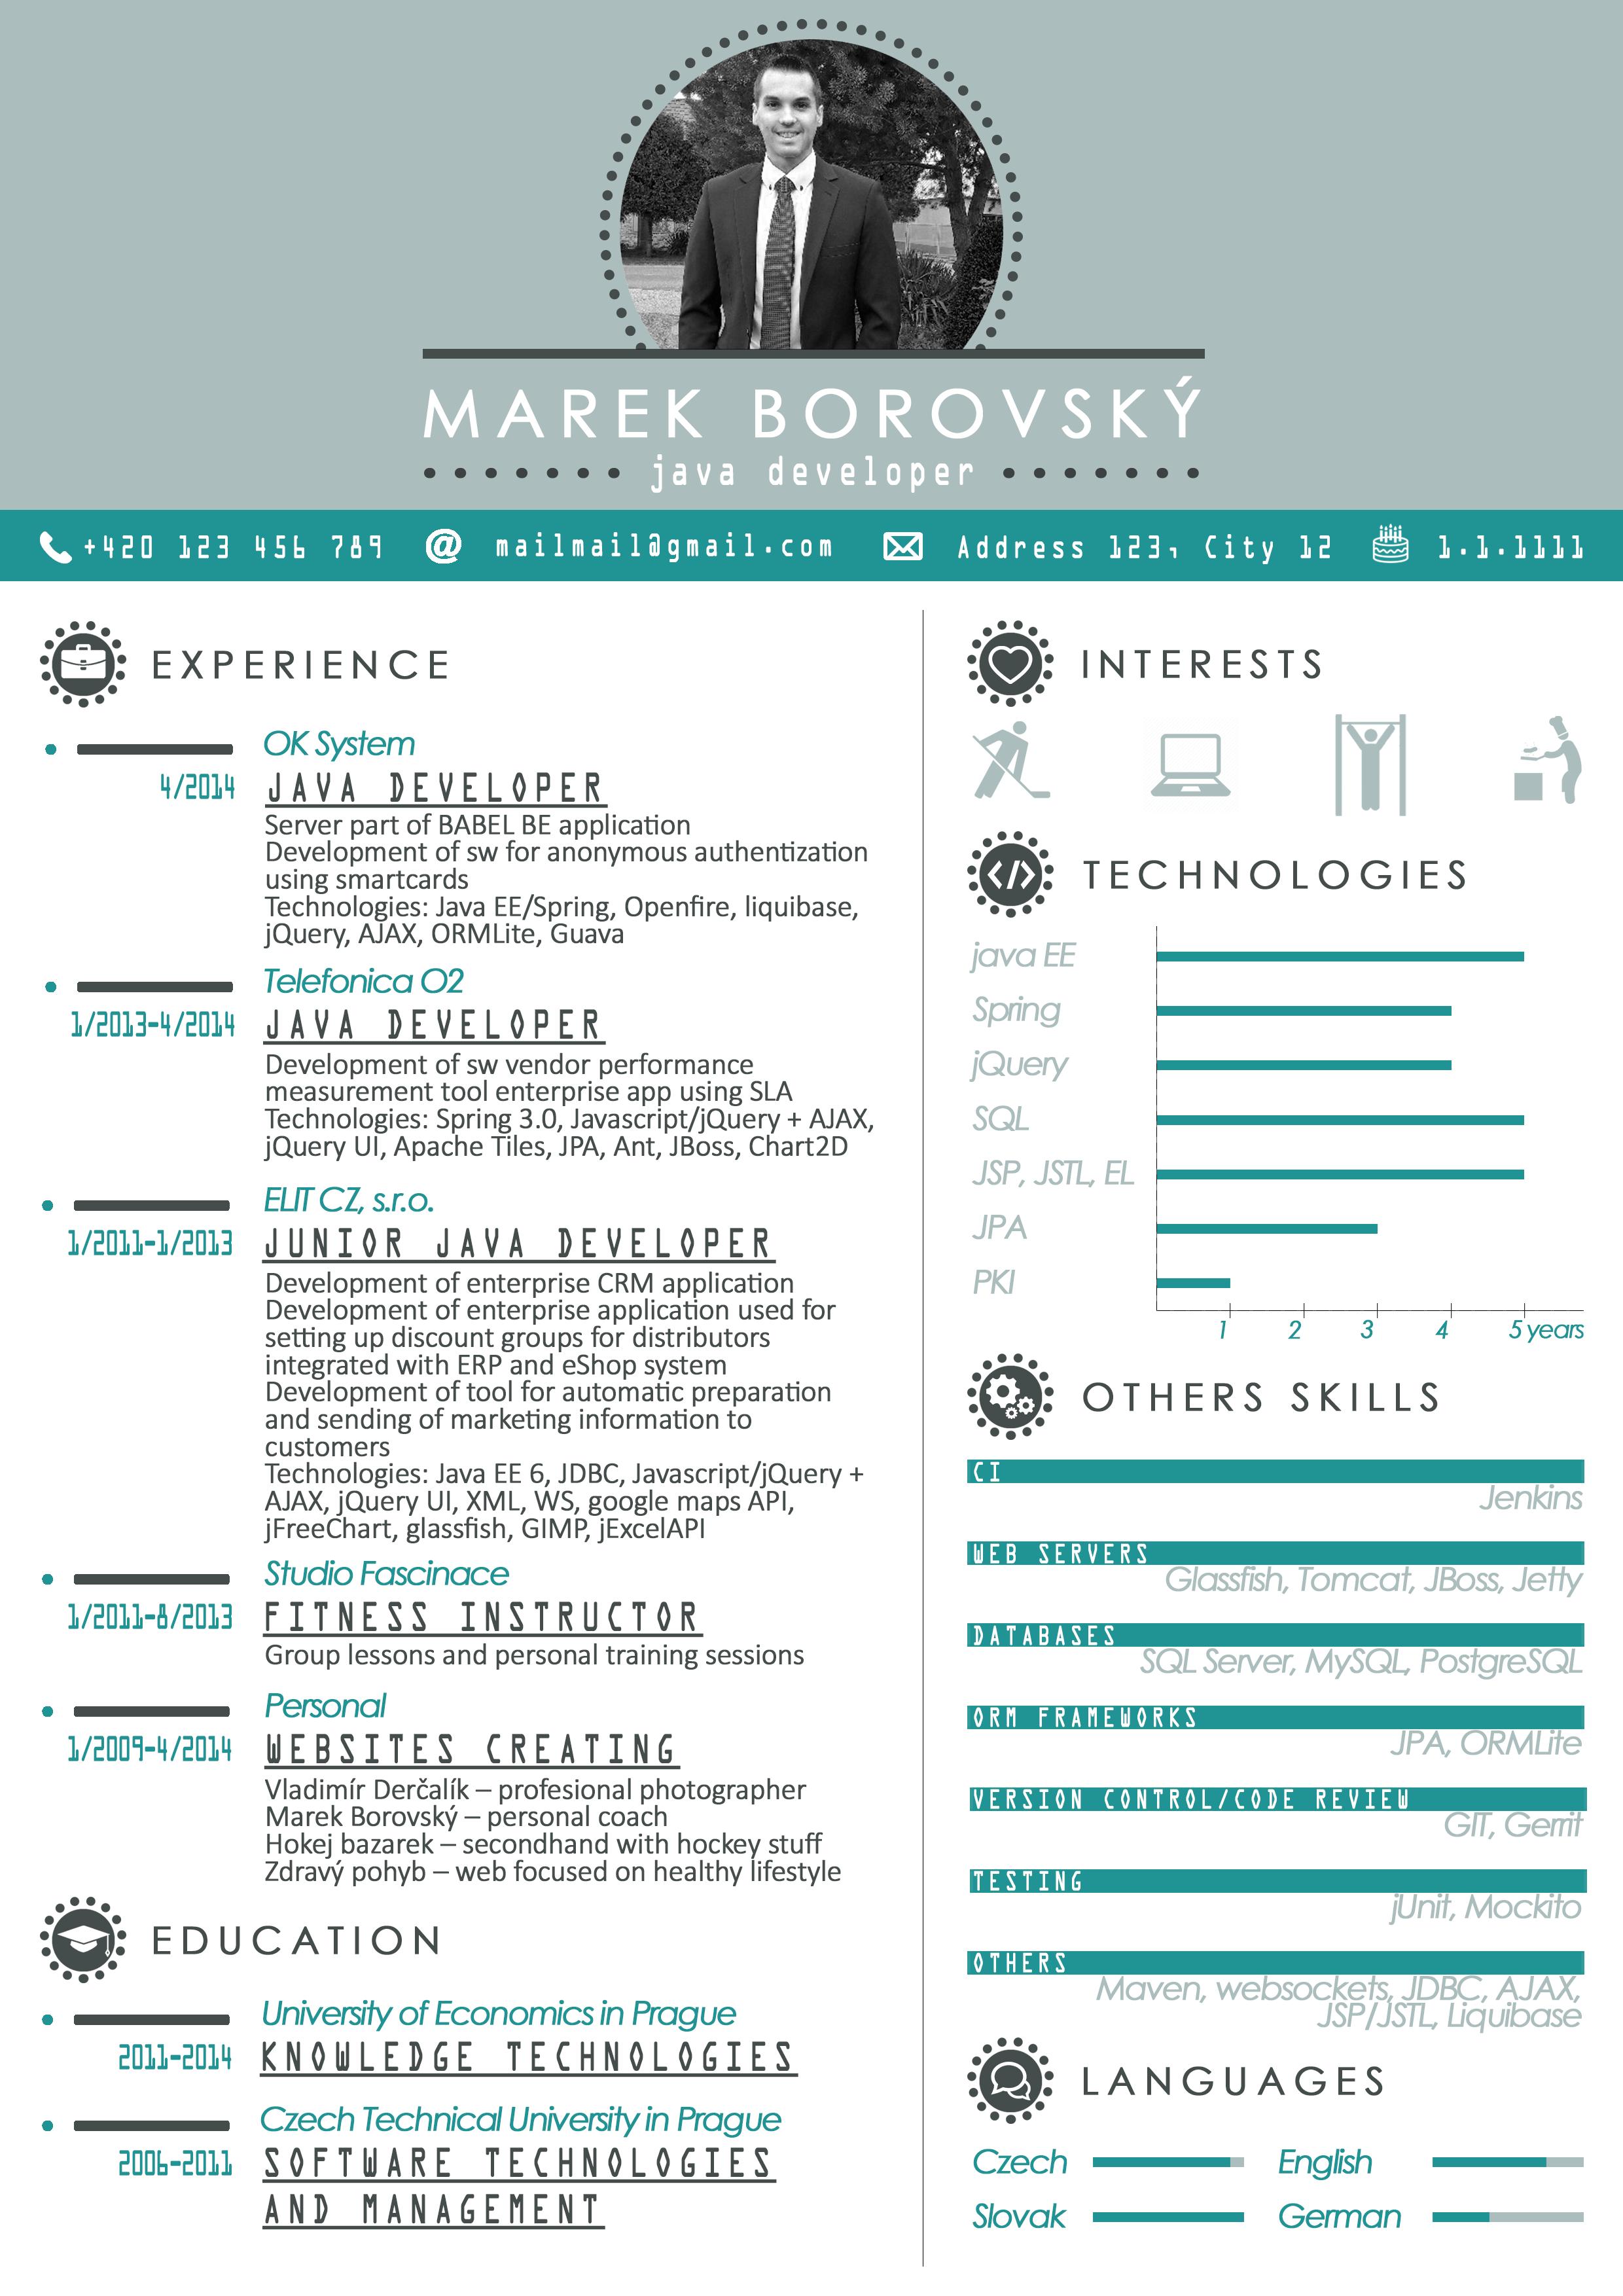 resume cv template graphics javadeveloper developer java blue - Ce Resume